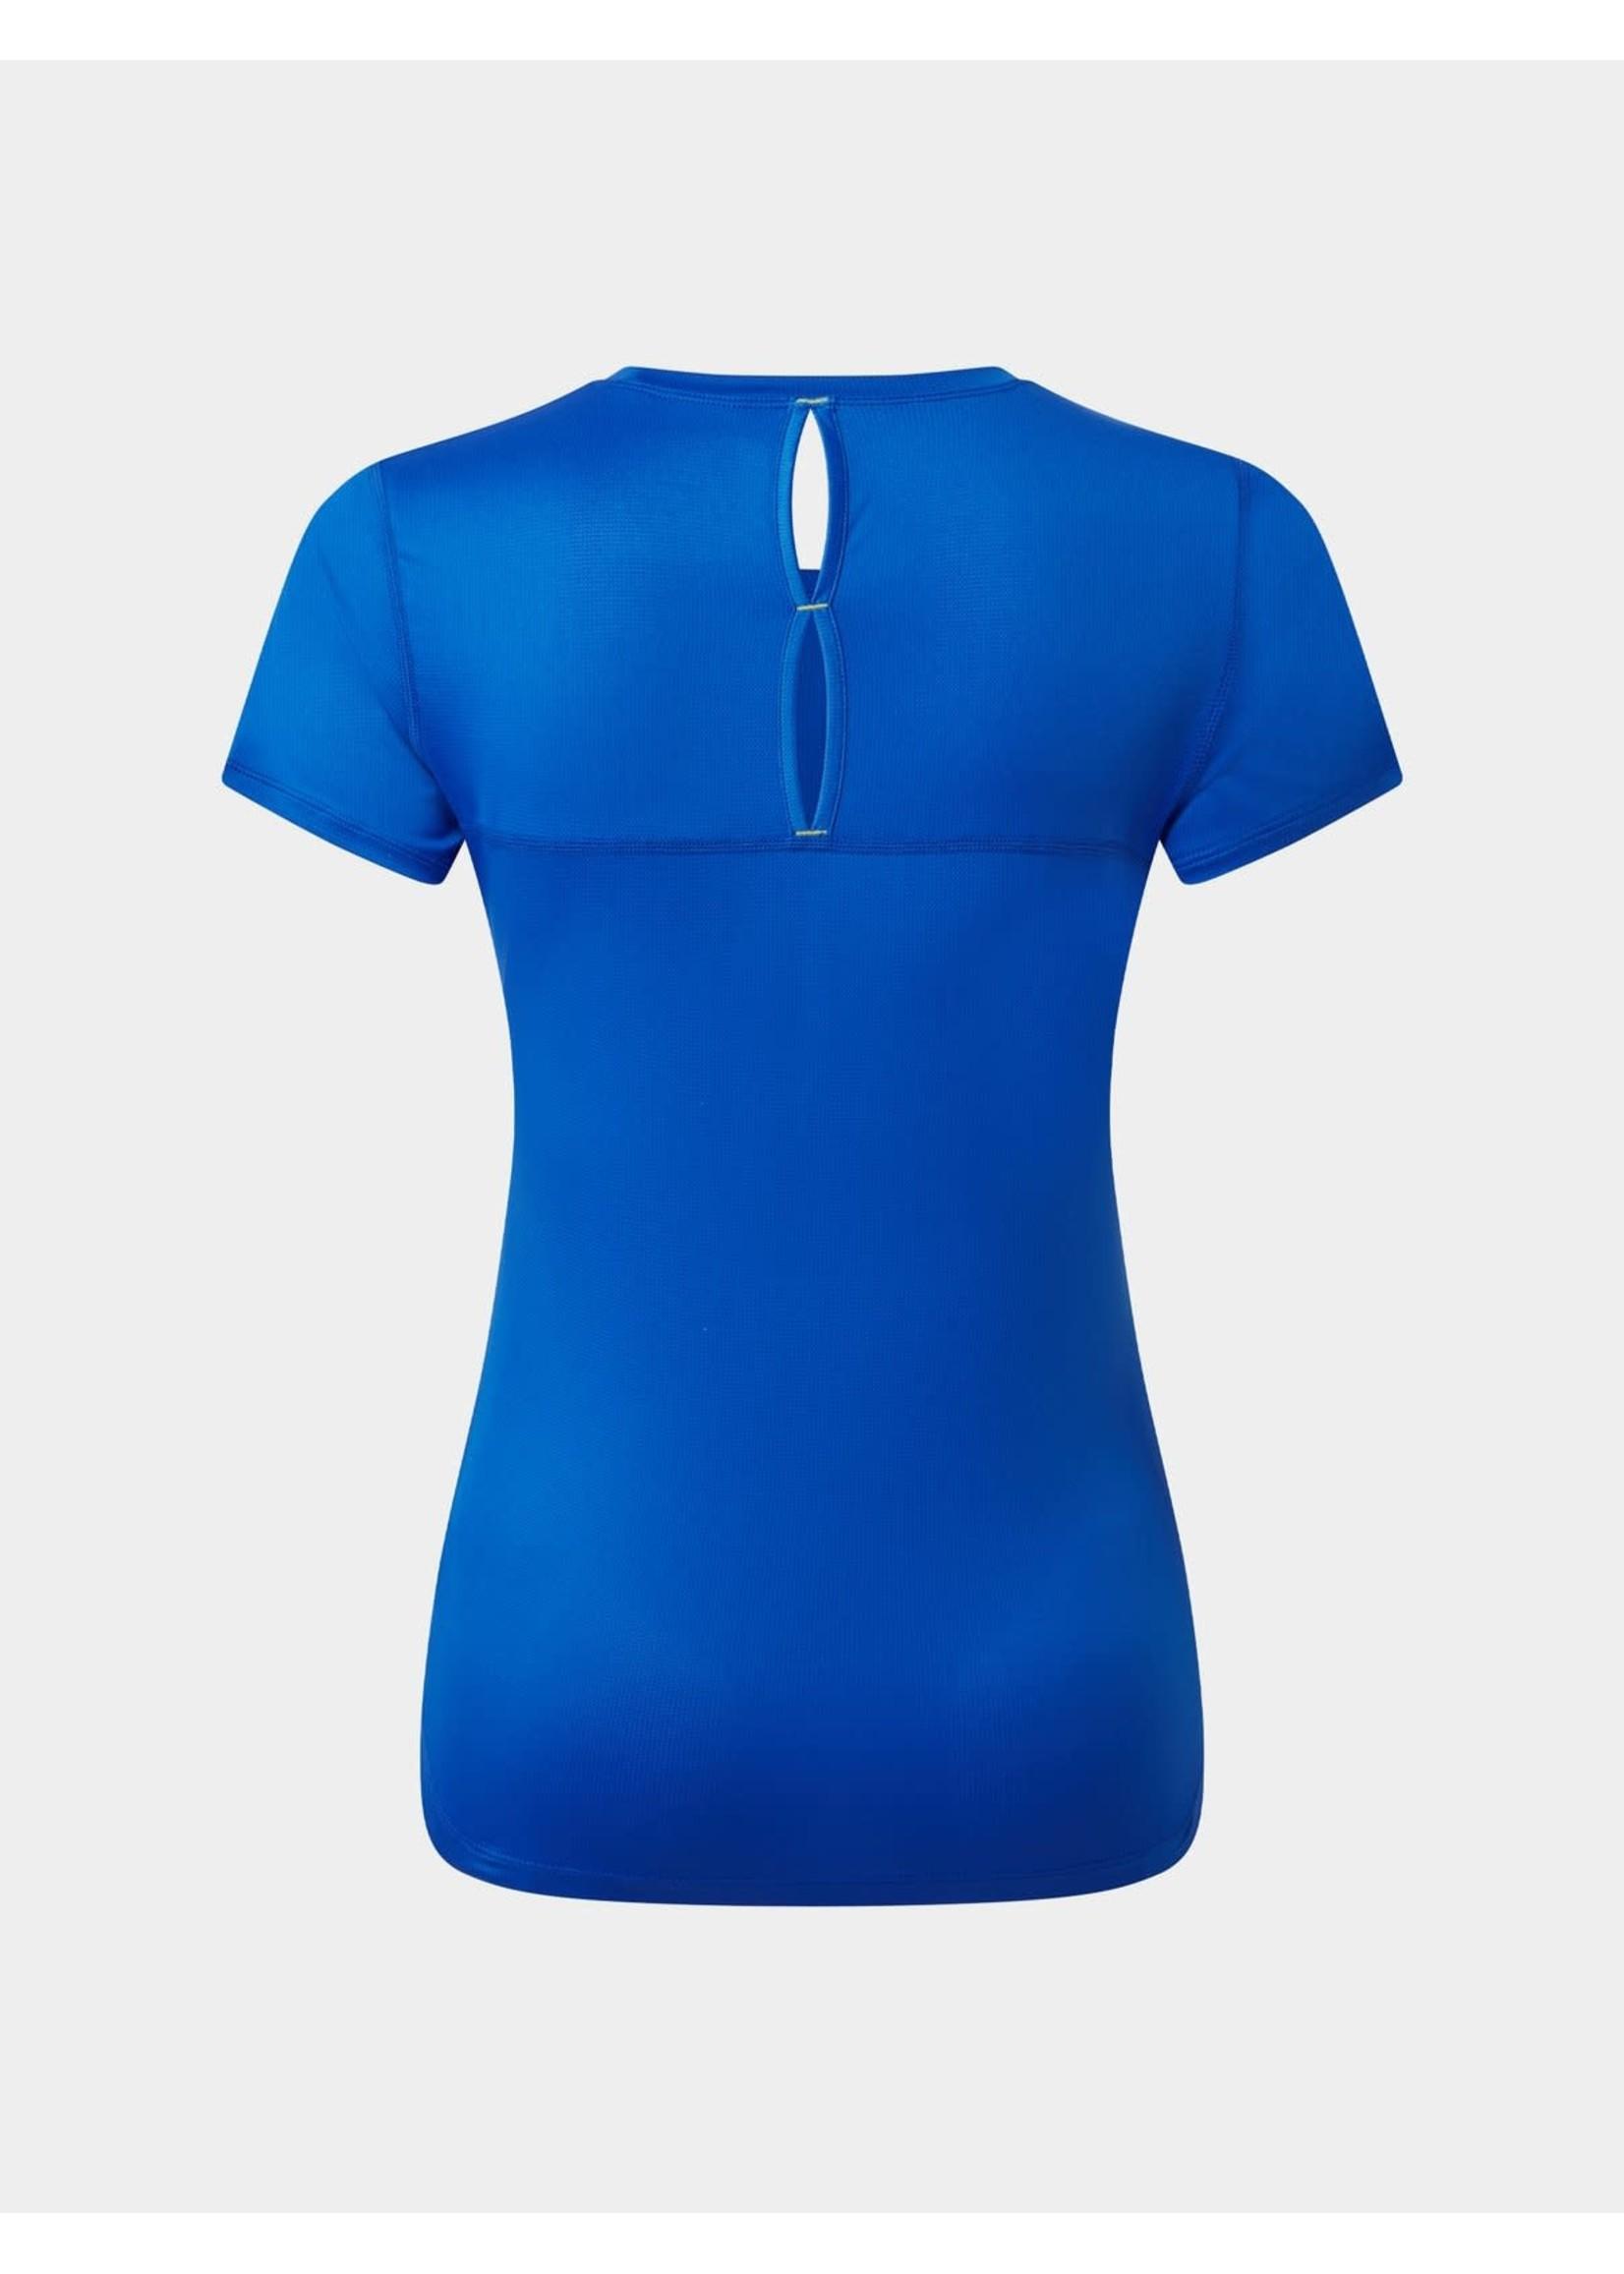 Ronhill Ron Hill Tech Revive Ladies T Shirt (2021) - Azurite/Sun